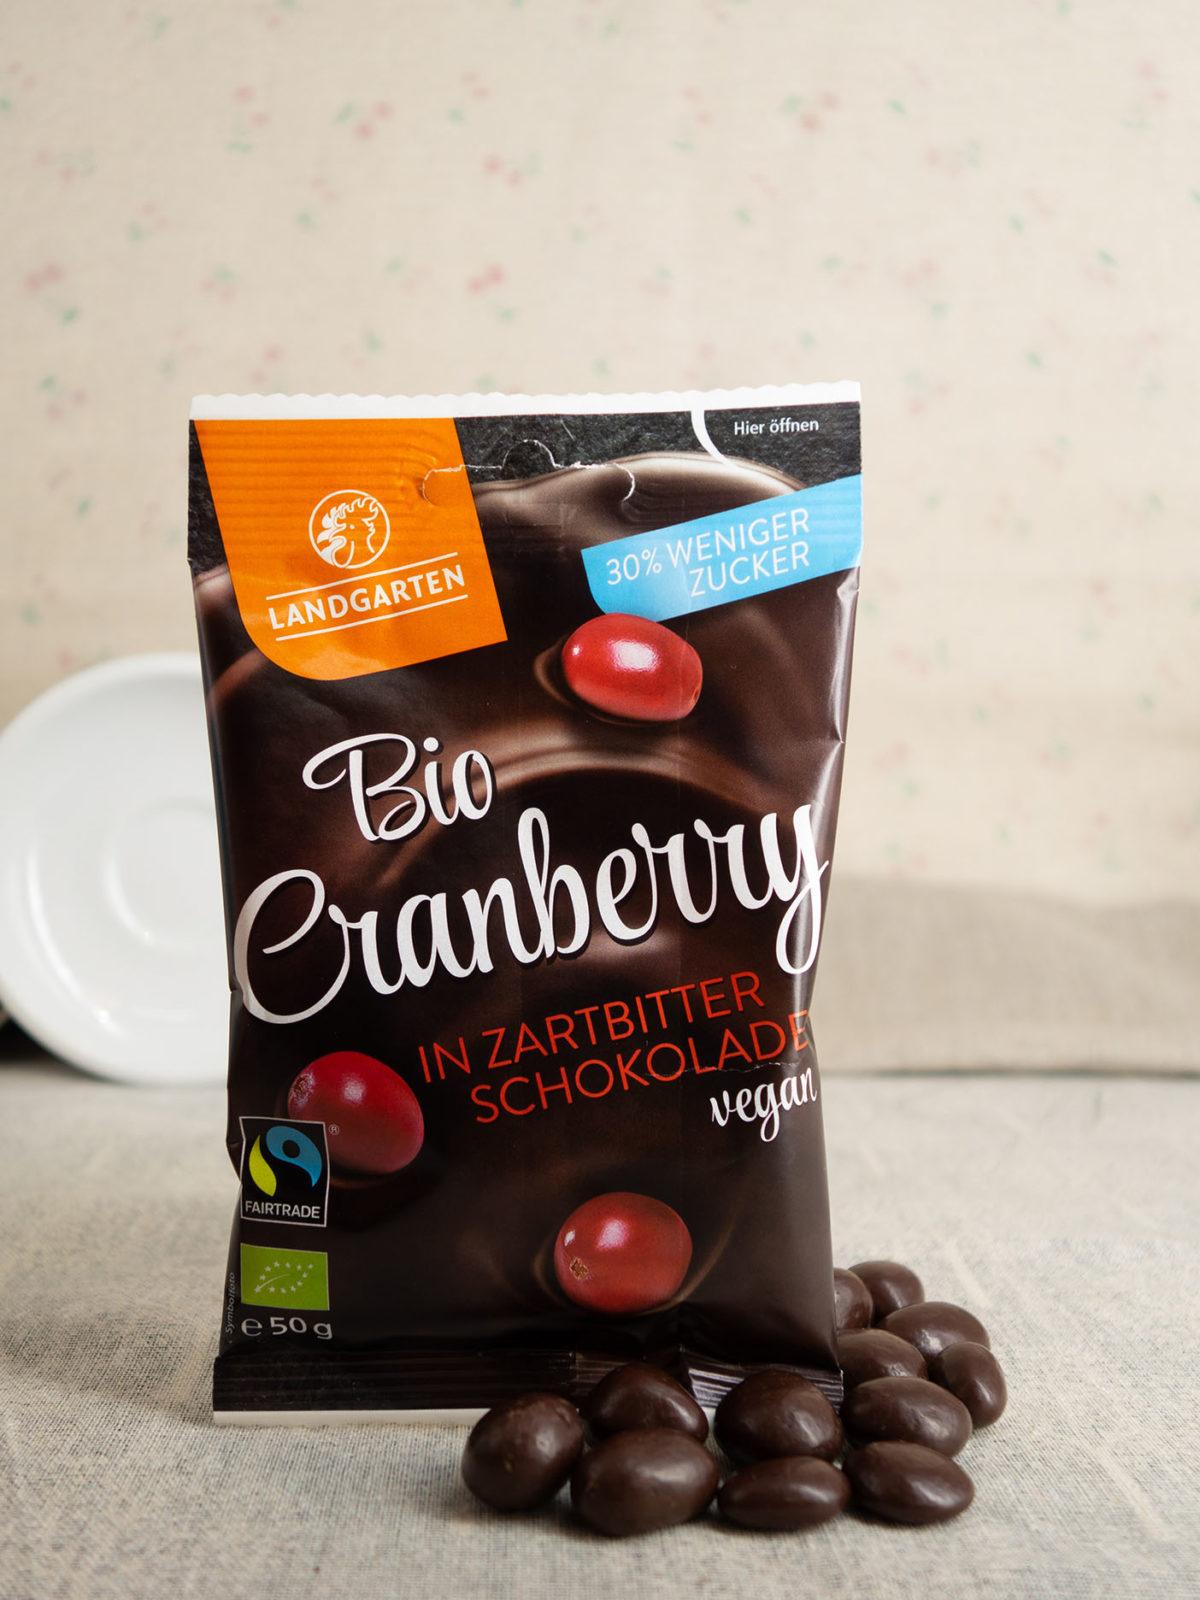 Boi Cranberry in Zartbitter-Schokolade